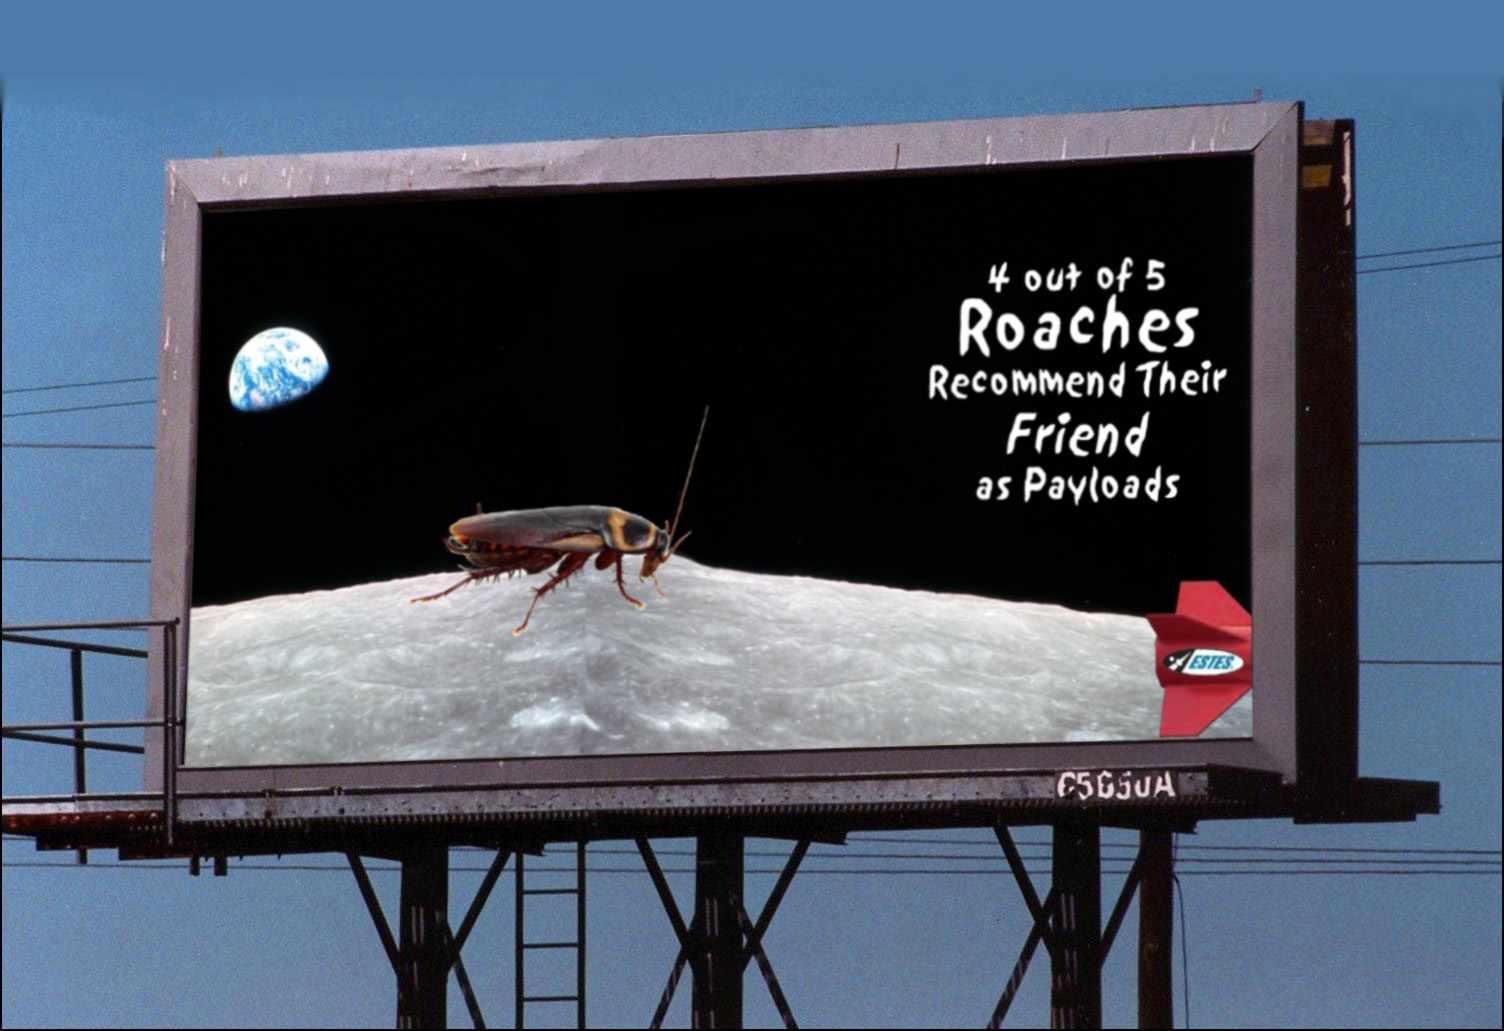 Estes Rockets Billboard